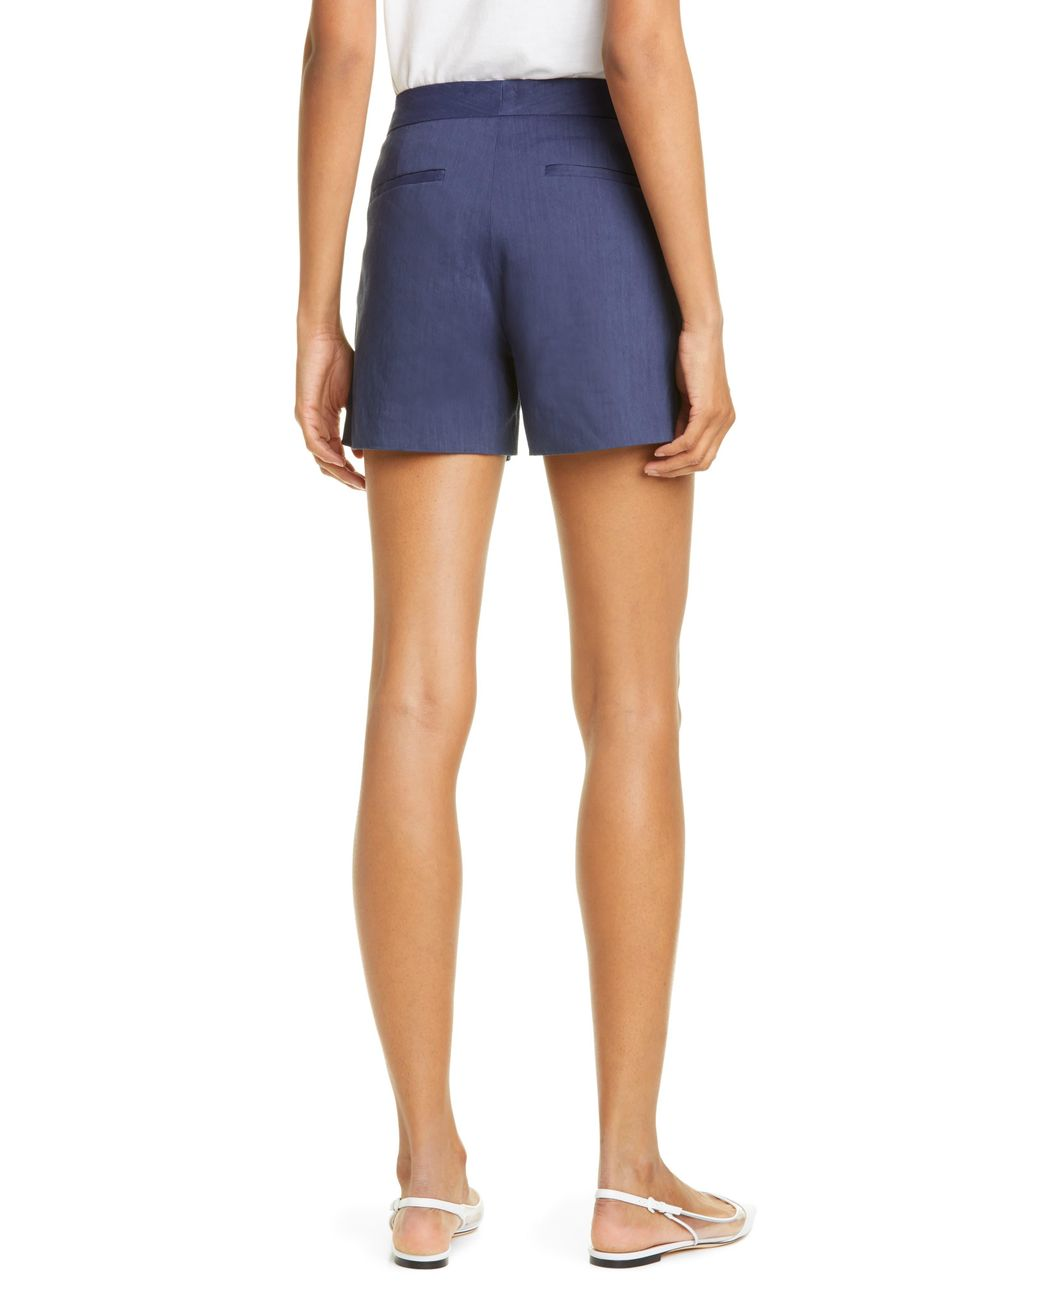 f3f5a3d8691e4 Theory Lynie R High Waist Linen Blend Shorts in Blue - Lyst